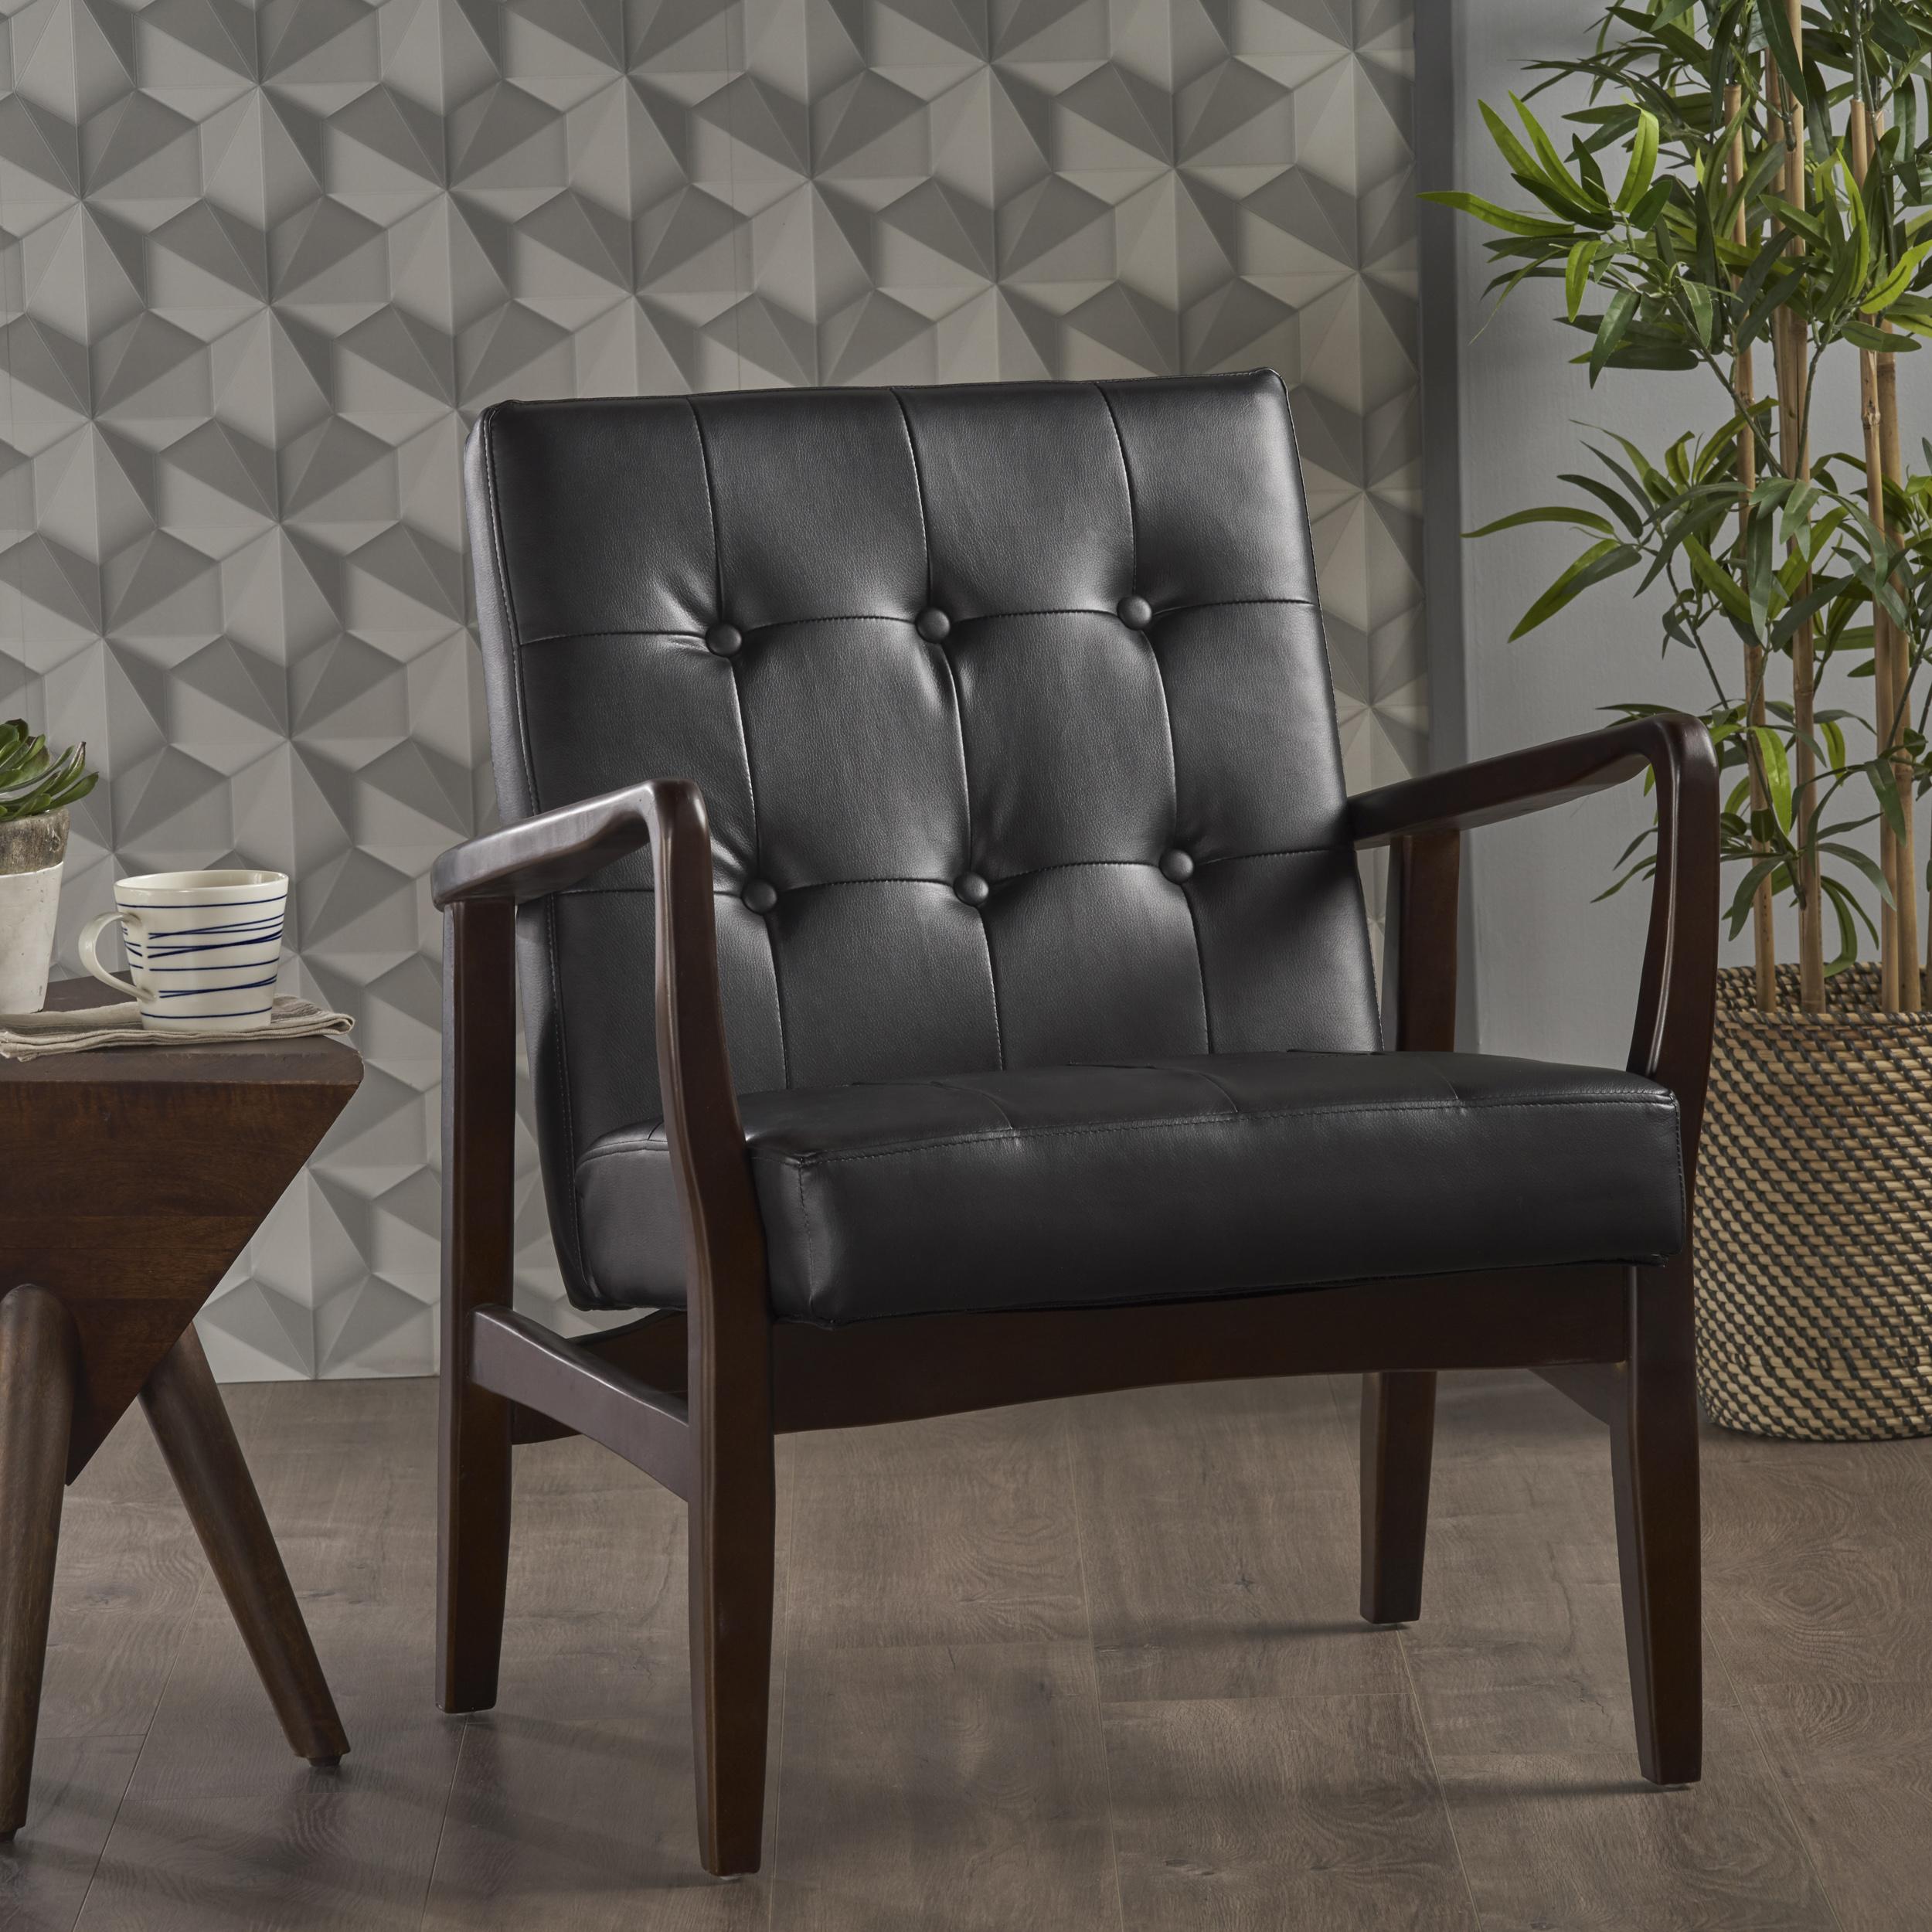 Noble House Everett Mid Century Modern Leather Club Chair, Black, Dark Espresso